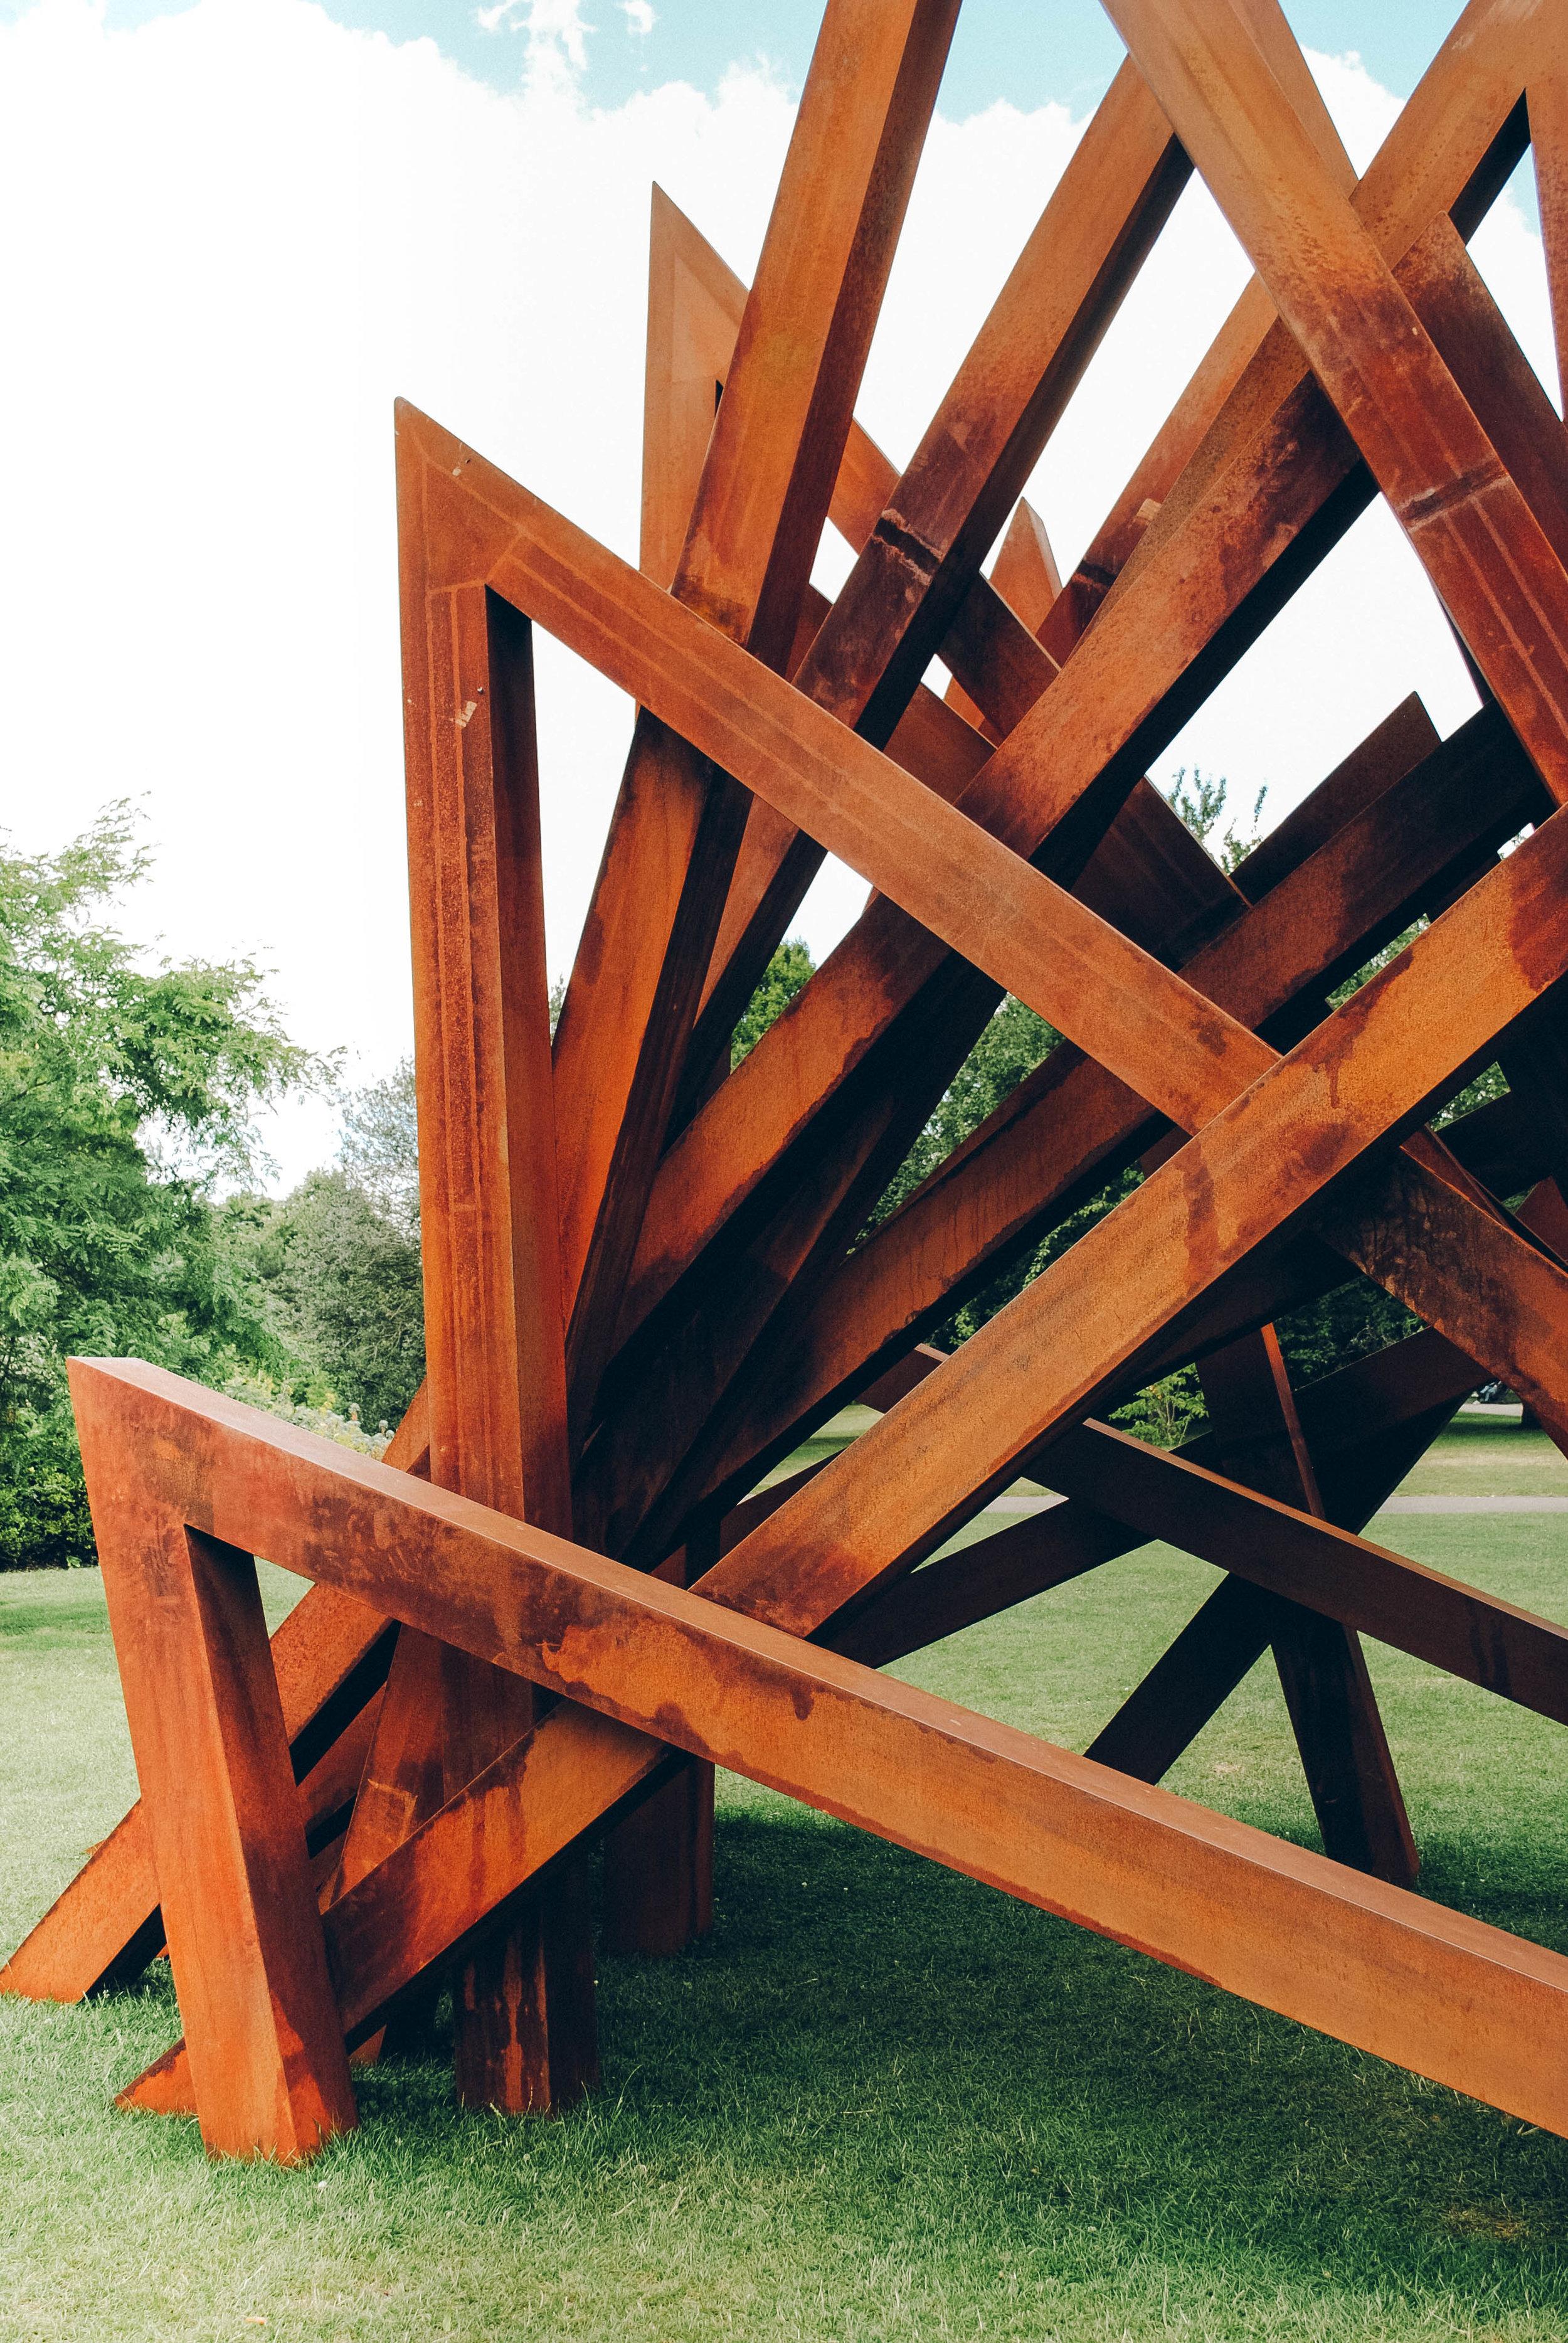 frieze sculpture regents park (10 of 15).jpg